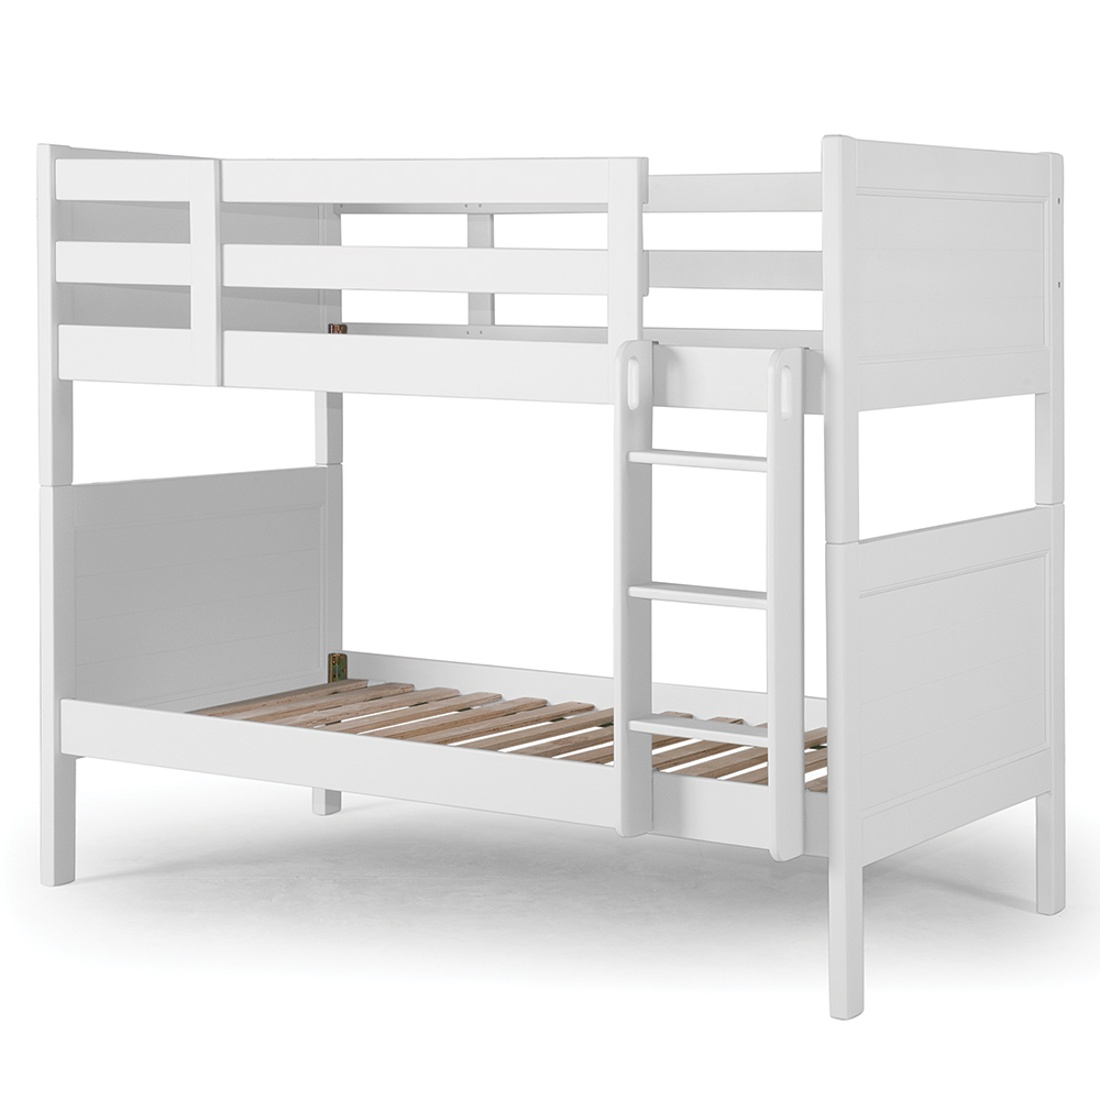 P'kolino Nesto Bunk Bed